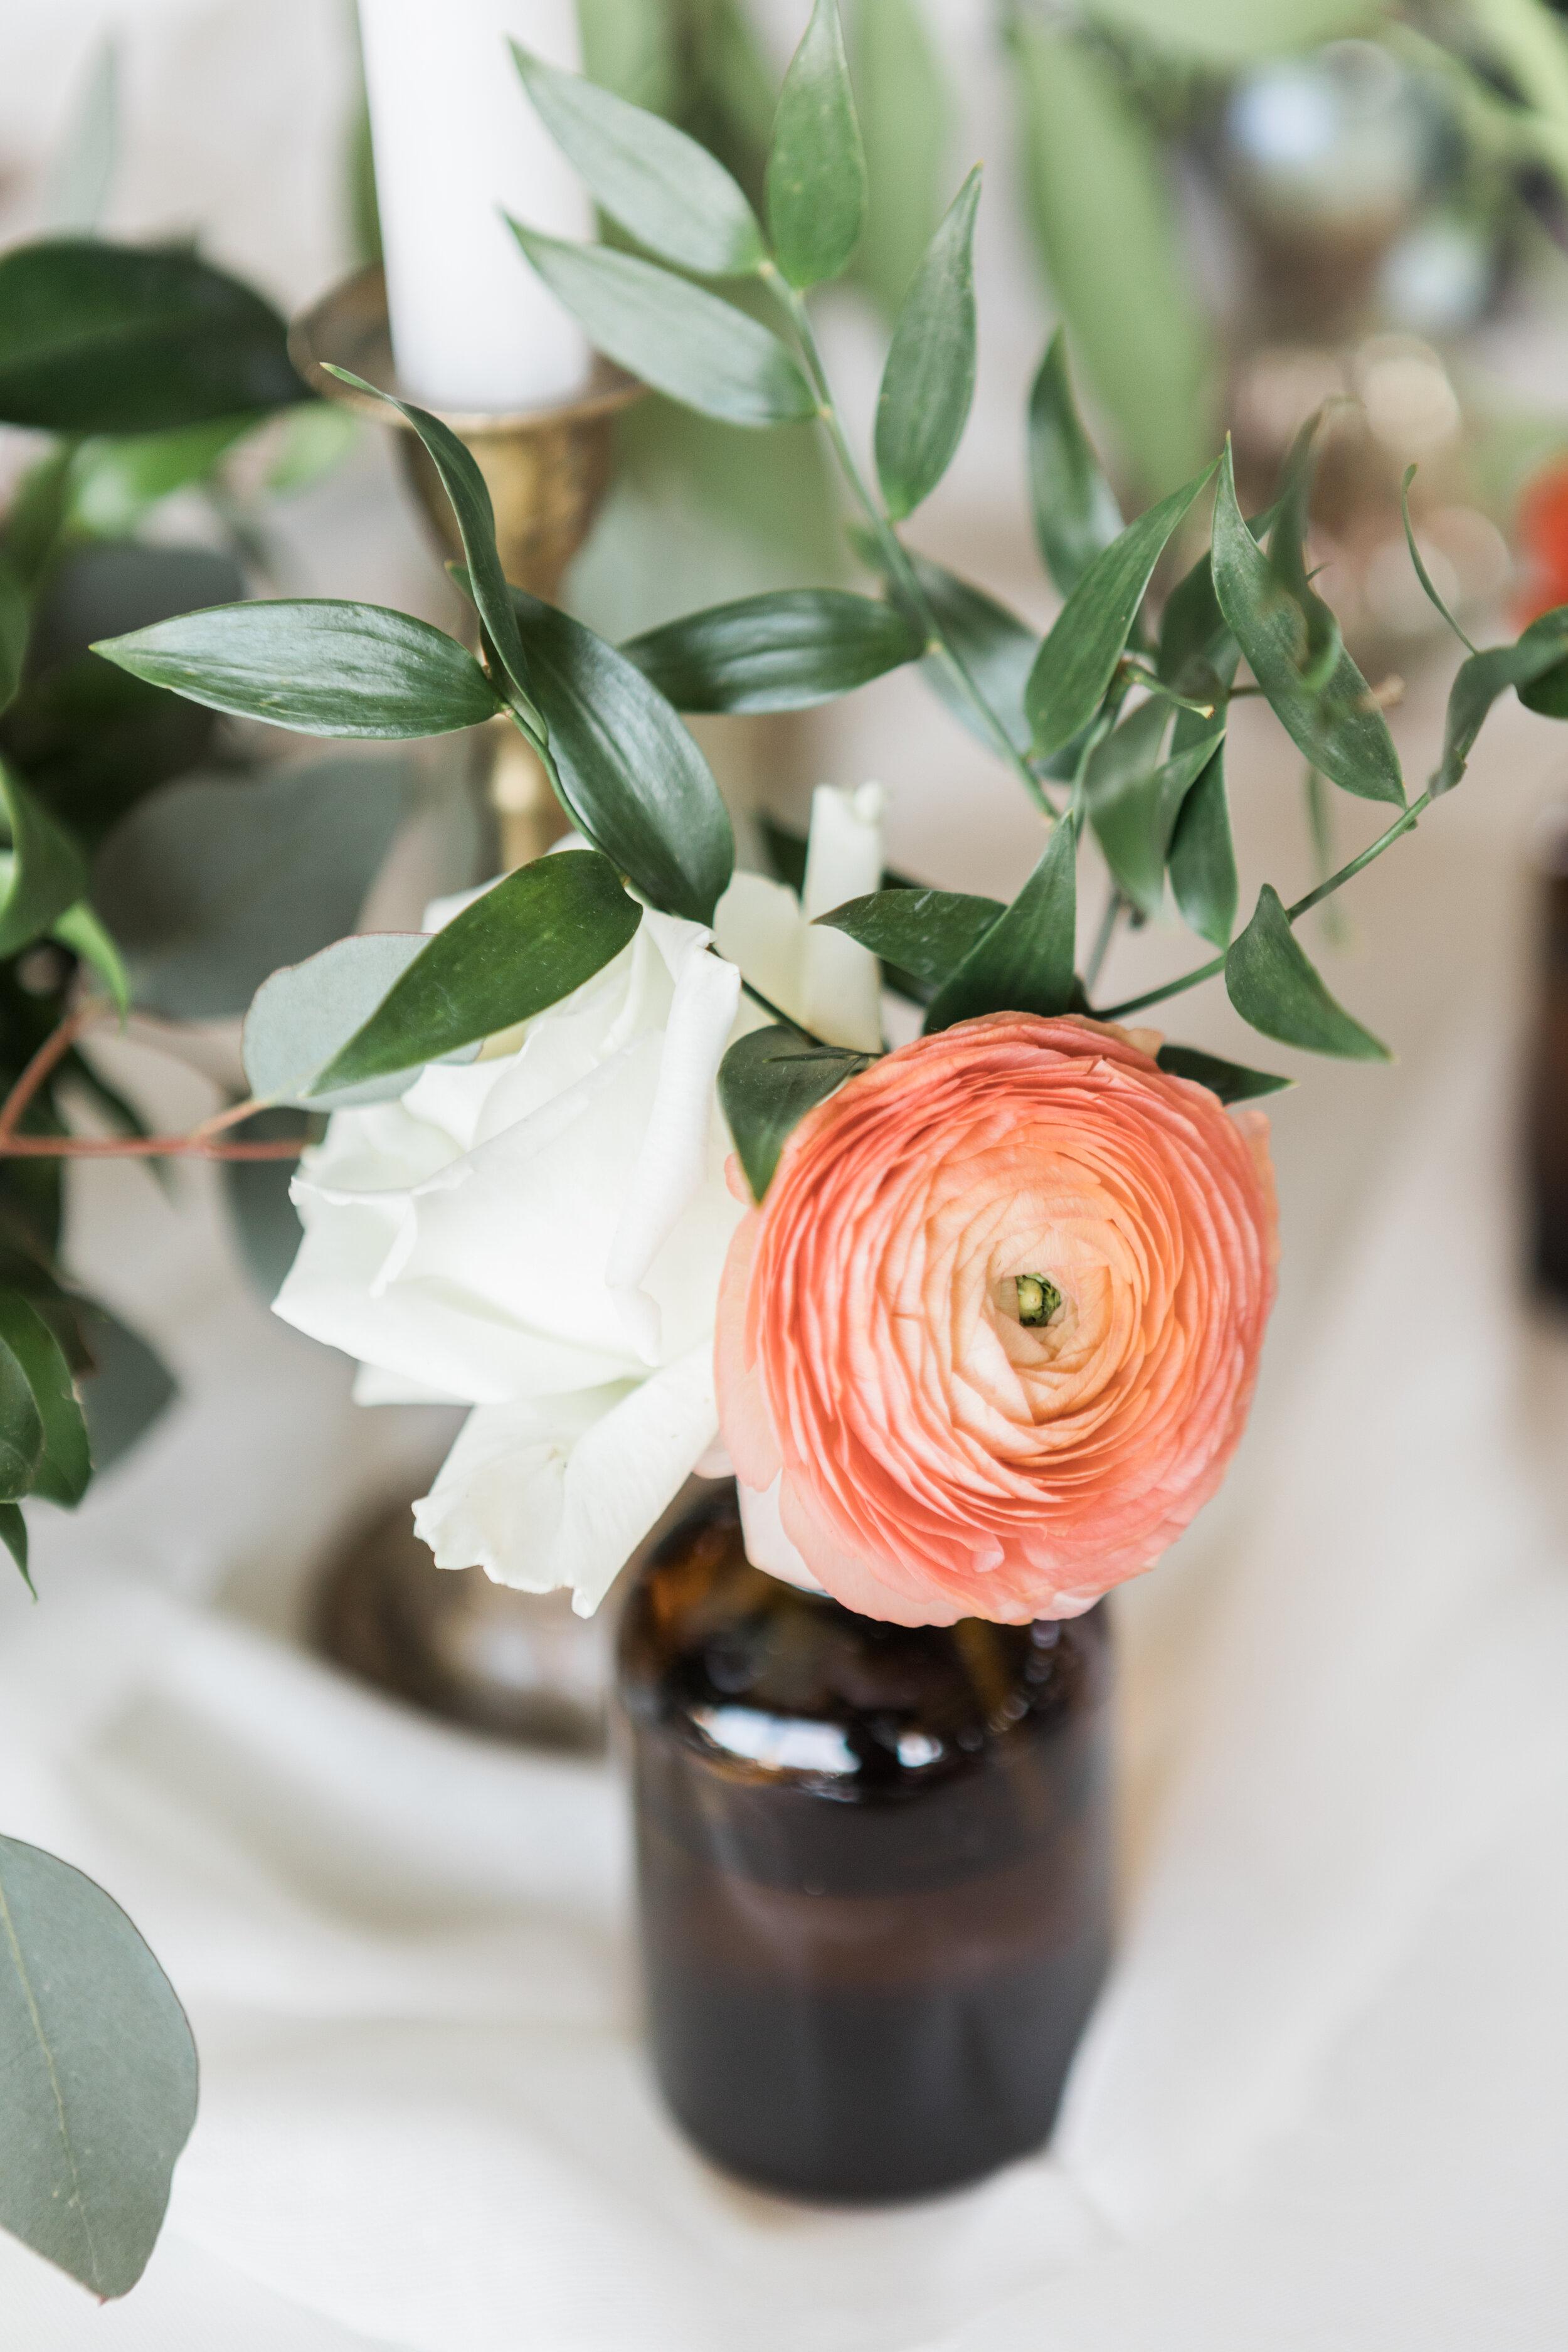 ivory-and-beau-blog-weddings-ivory-and-beau-couple-dominique-and-andres-savannah-florist-wedding-planning-savannah-bridal-boutique-wedding-flowers-KIP_WEBERWEDDING_RAILROADMUSEUM-1164.JPG